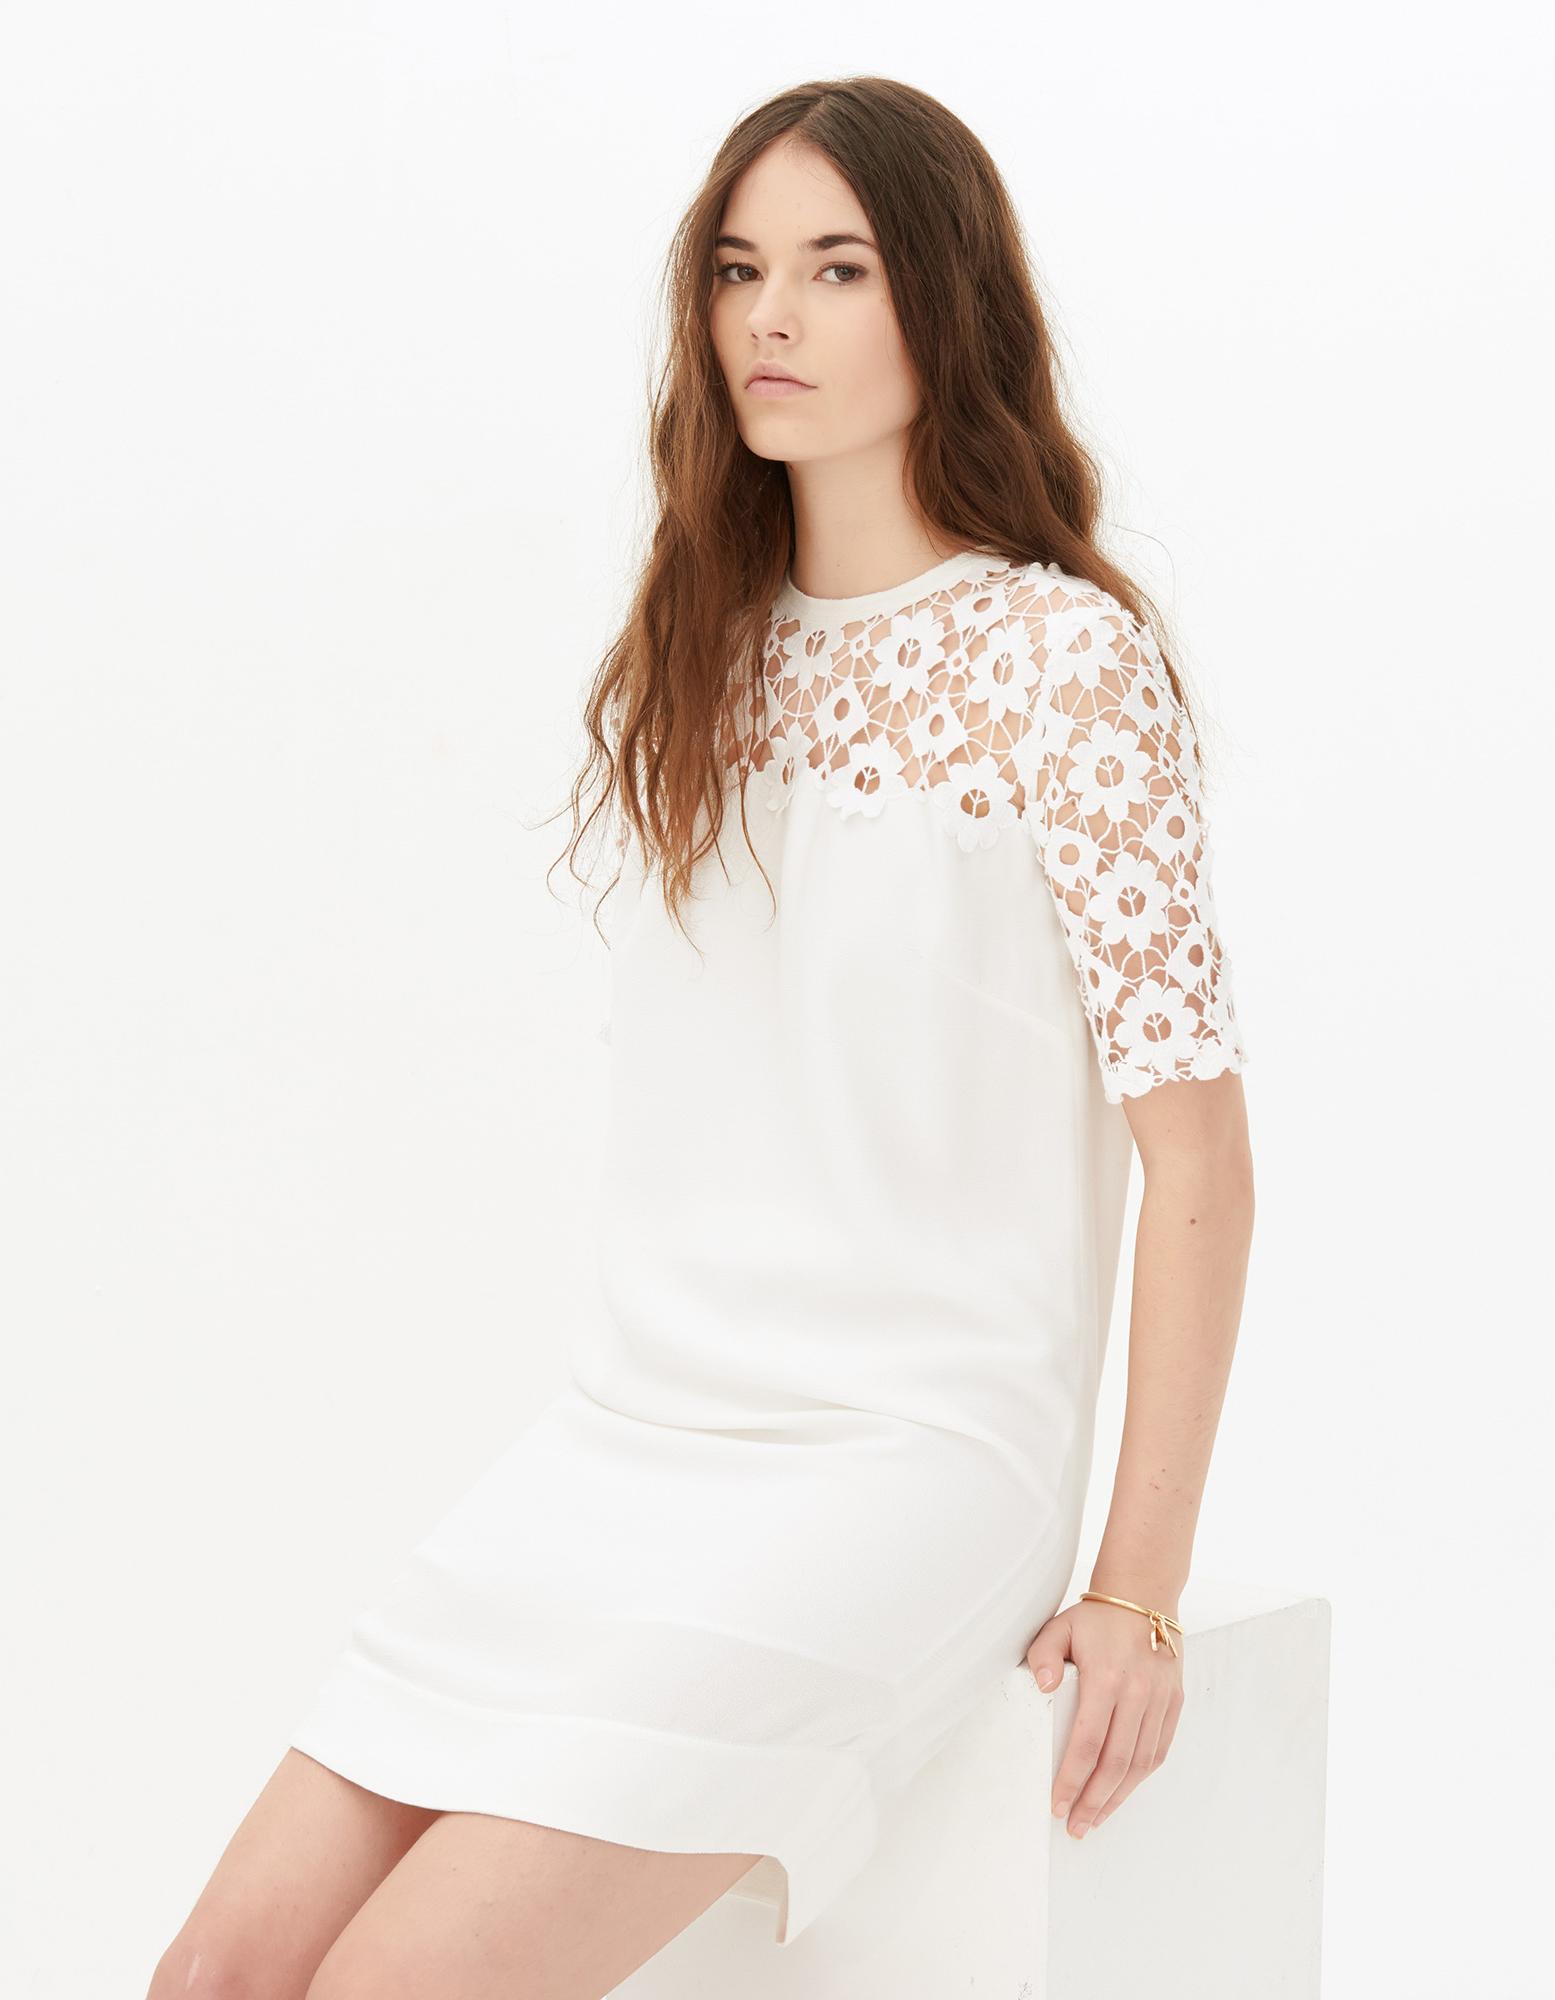 robe de mari e courte bi mati res sandro les plus belles robes de mari e courtes elle. Black Bedroom Furniture Sets. Home Design Ideas